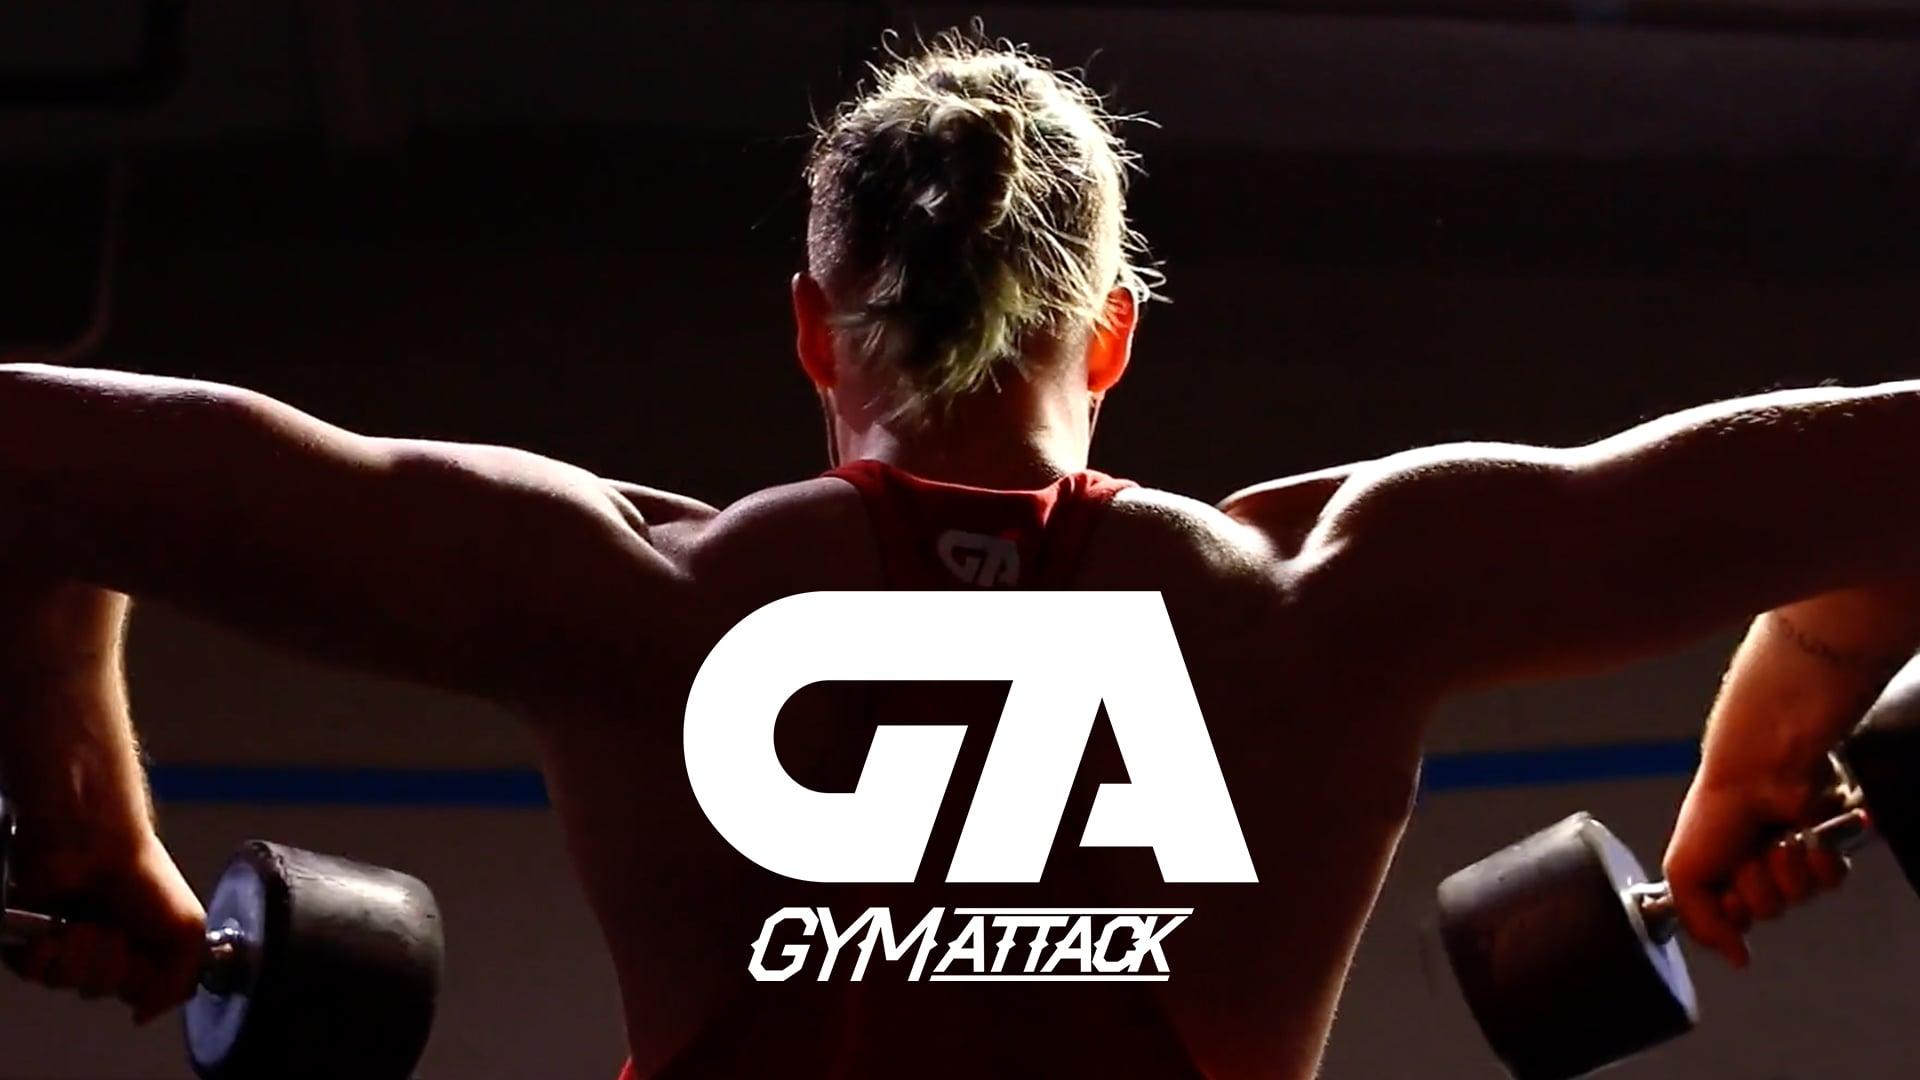 Gym Attack